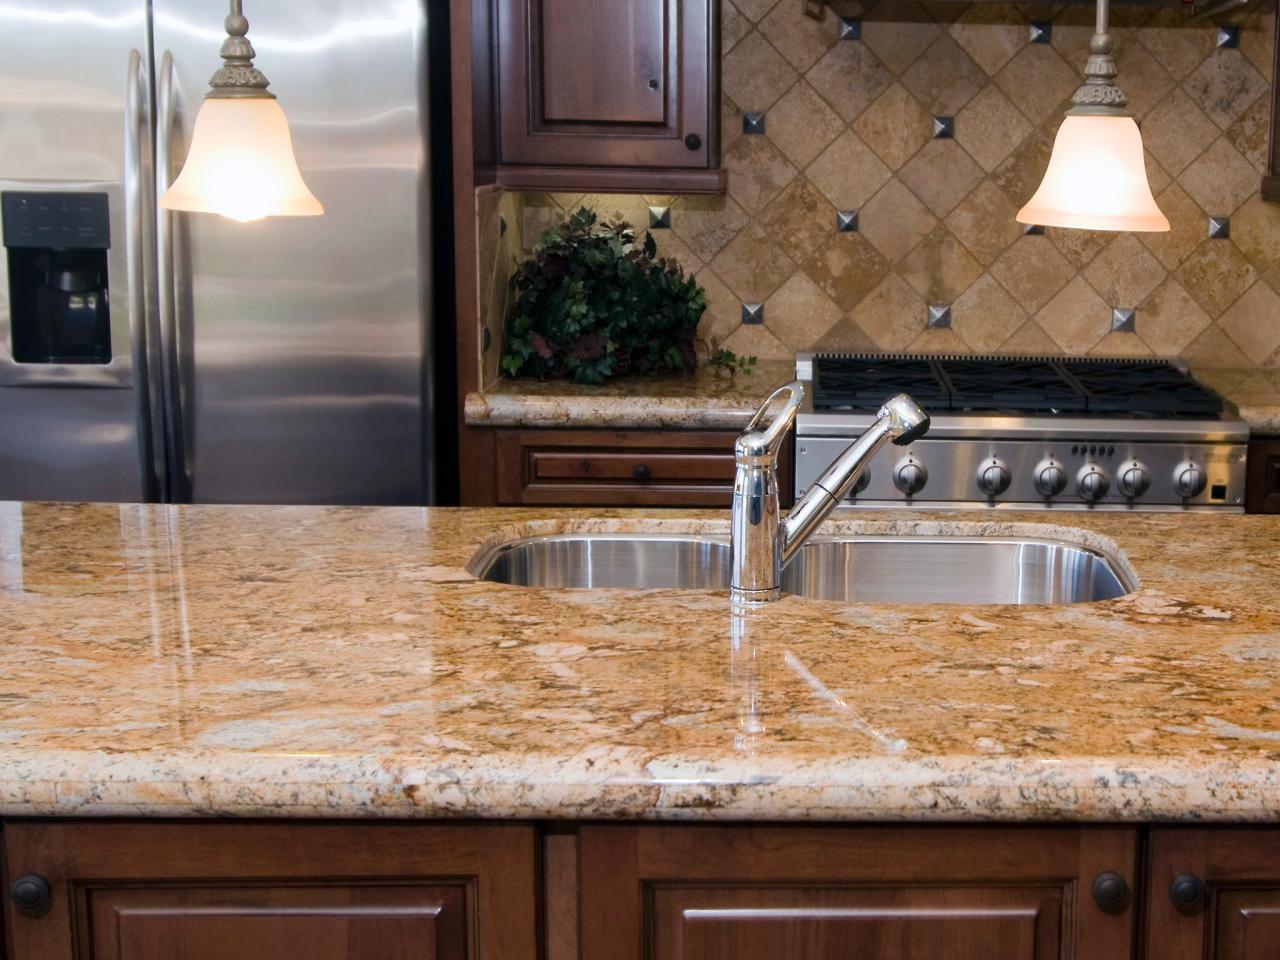 granite kitchen counter pictures photo - 6